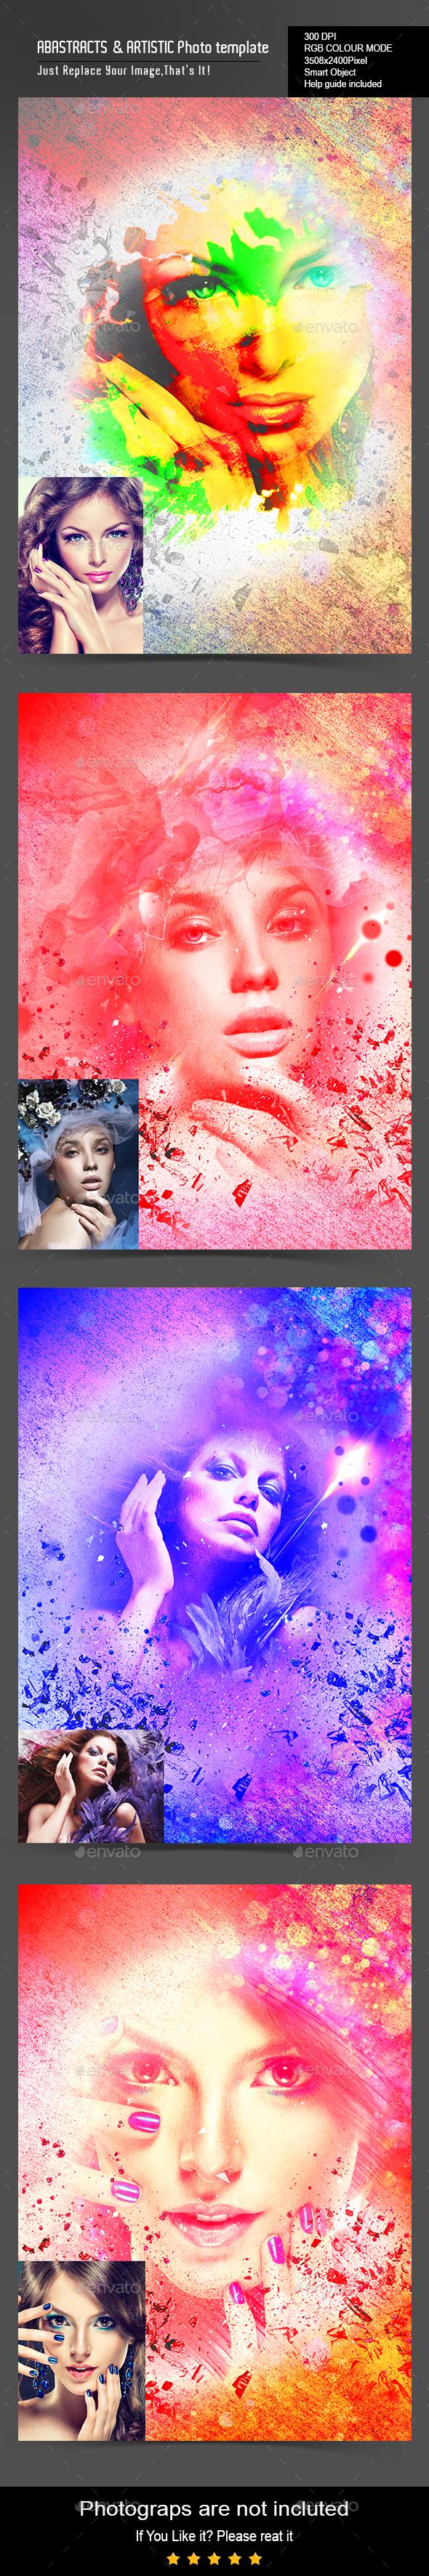 Artistic Photo Template - Artistic Photo Templates